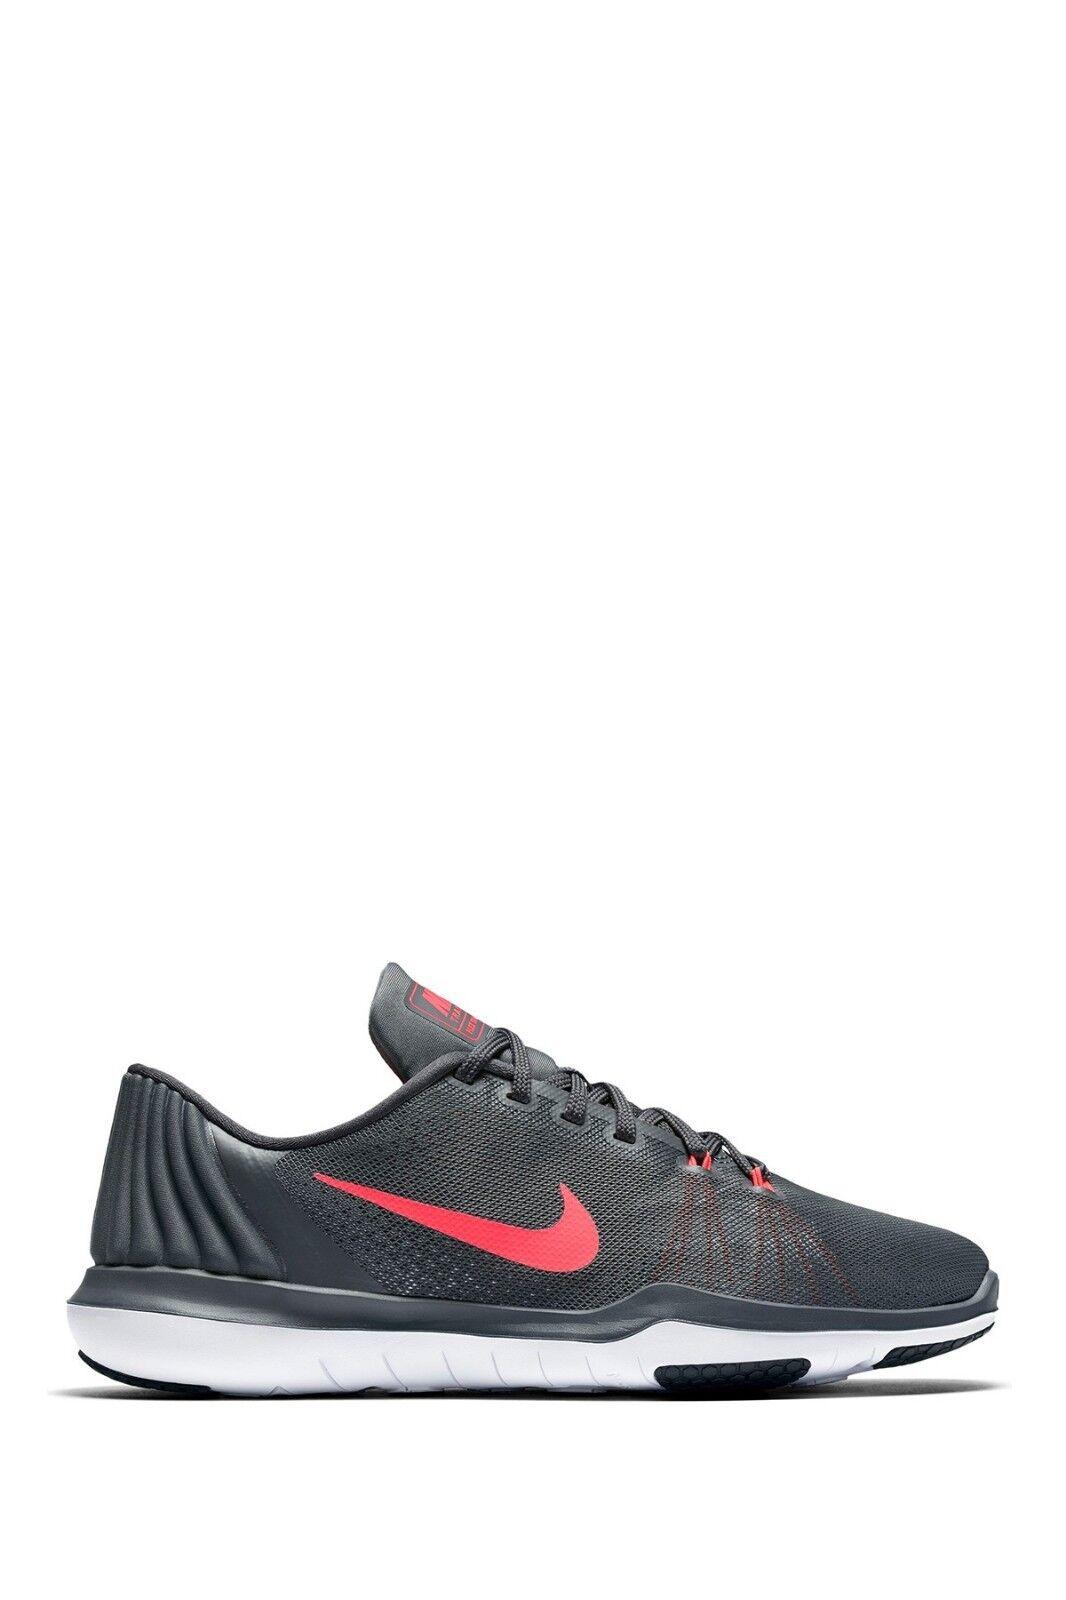 NEW NEW NEW Nike Flex Supreme Training Sneaker SZ 8 DK GRY-HT PNC  80 f08e4f